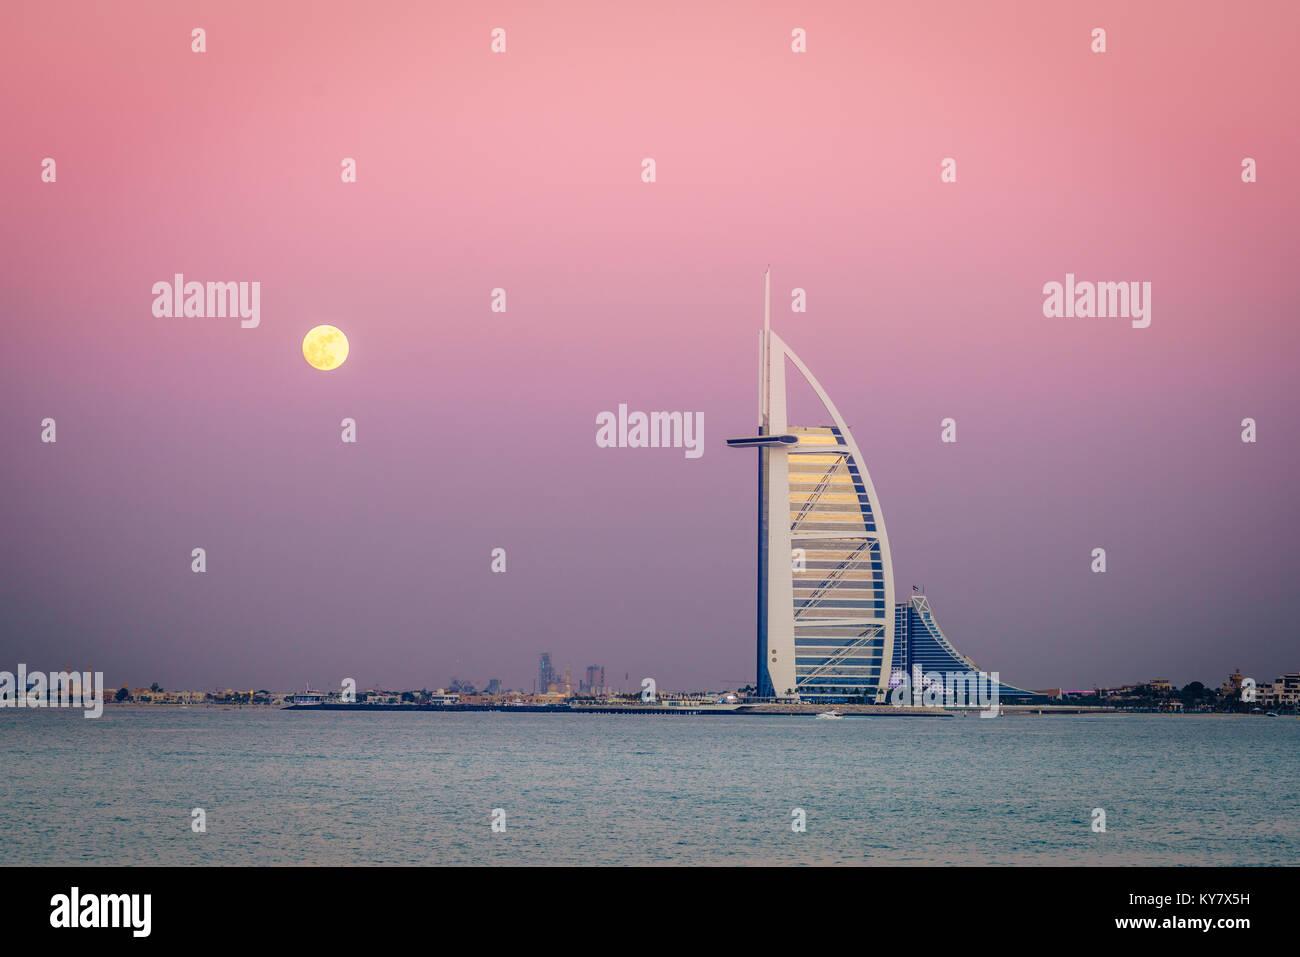 Dubai, Emiratos Árabes Unidos, Diciembre 13, 2016: La luna llena se alza sobre el Burj Al Arab, el único Imagen De Stock